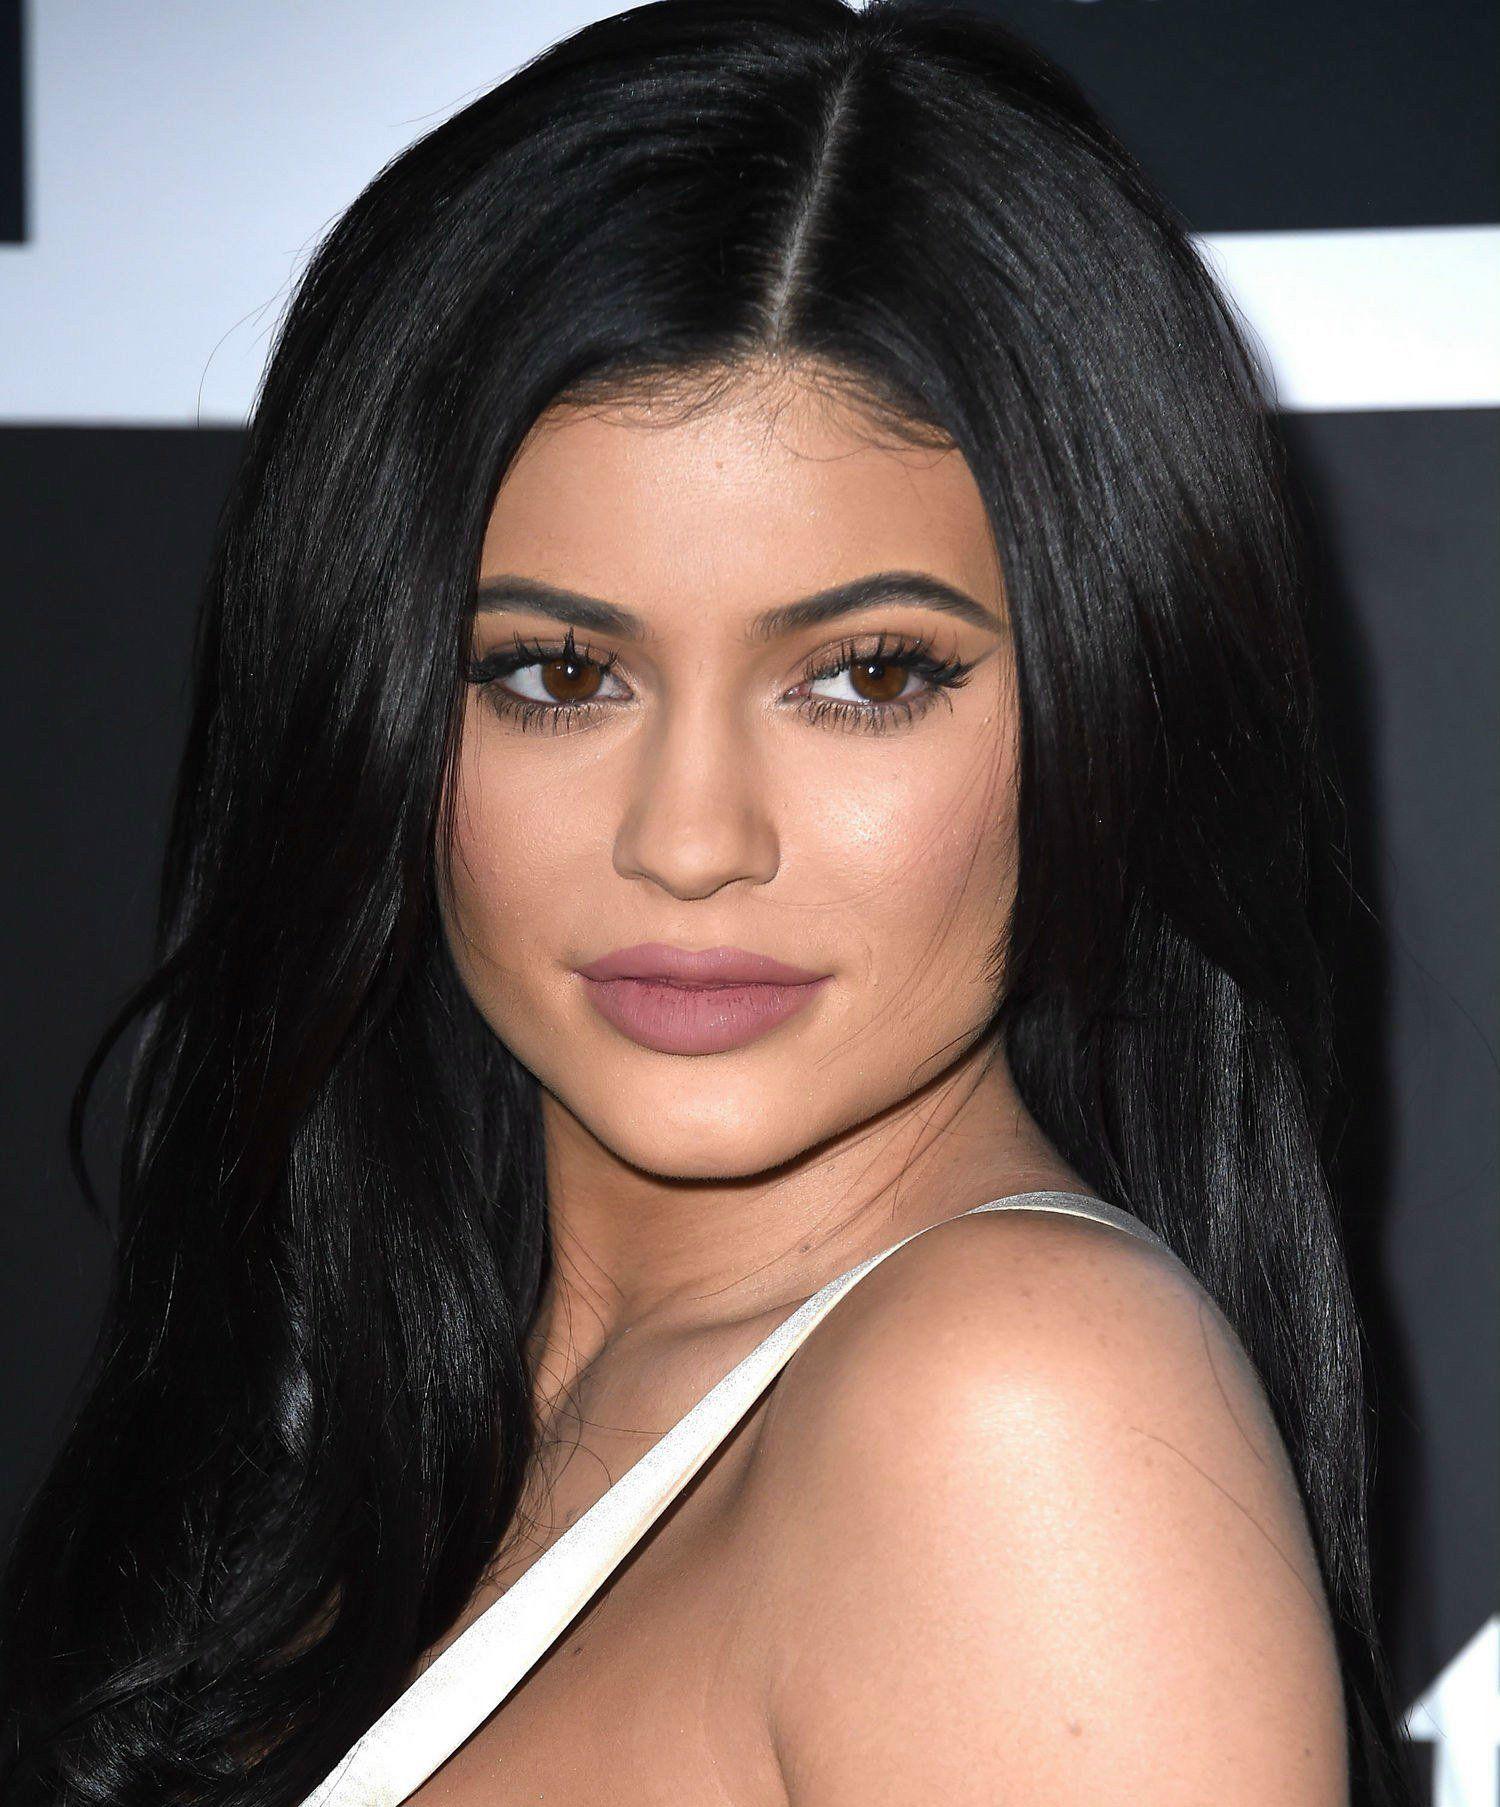 beauty-2016-01-kylie-jenner-makeup-hair-main-beauty